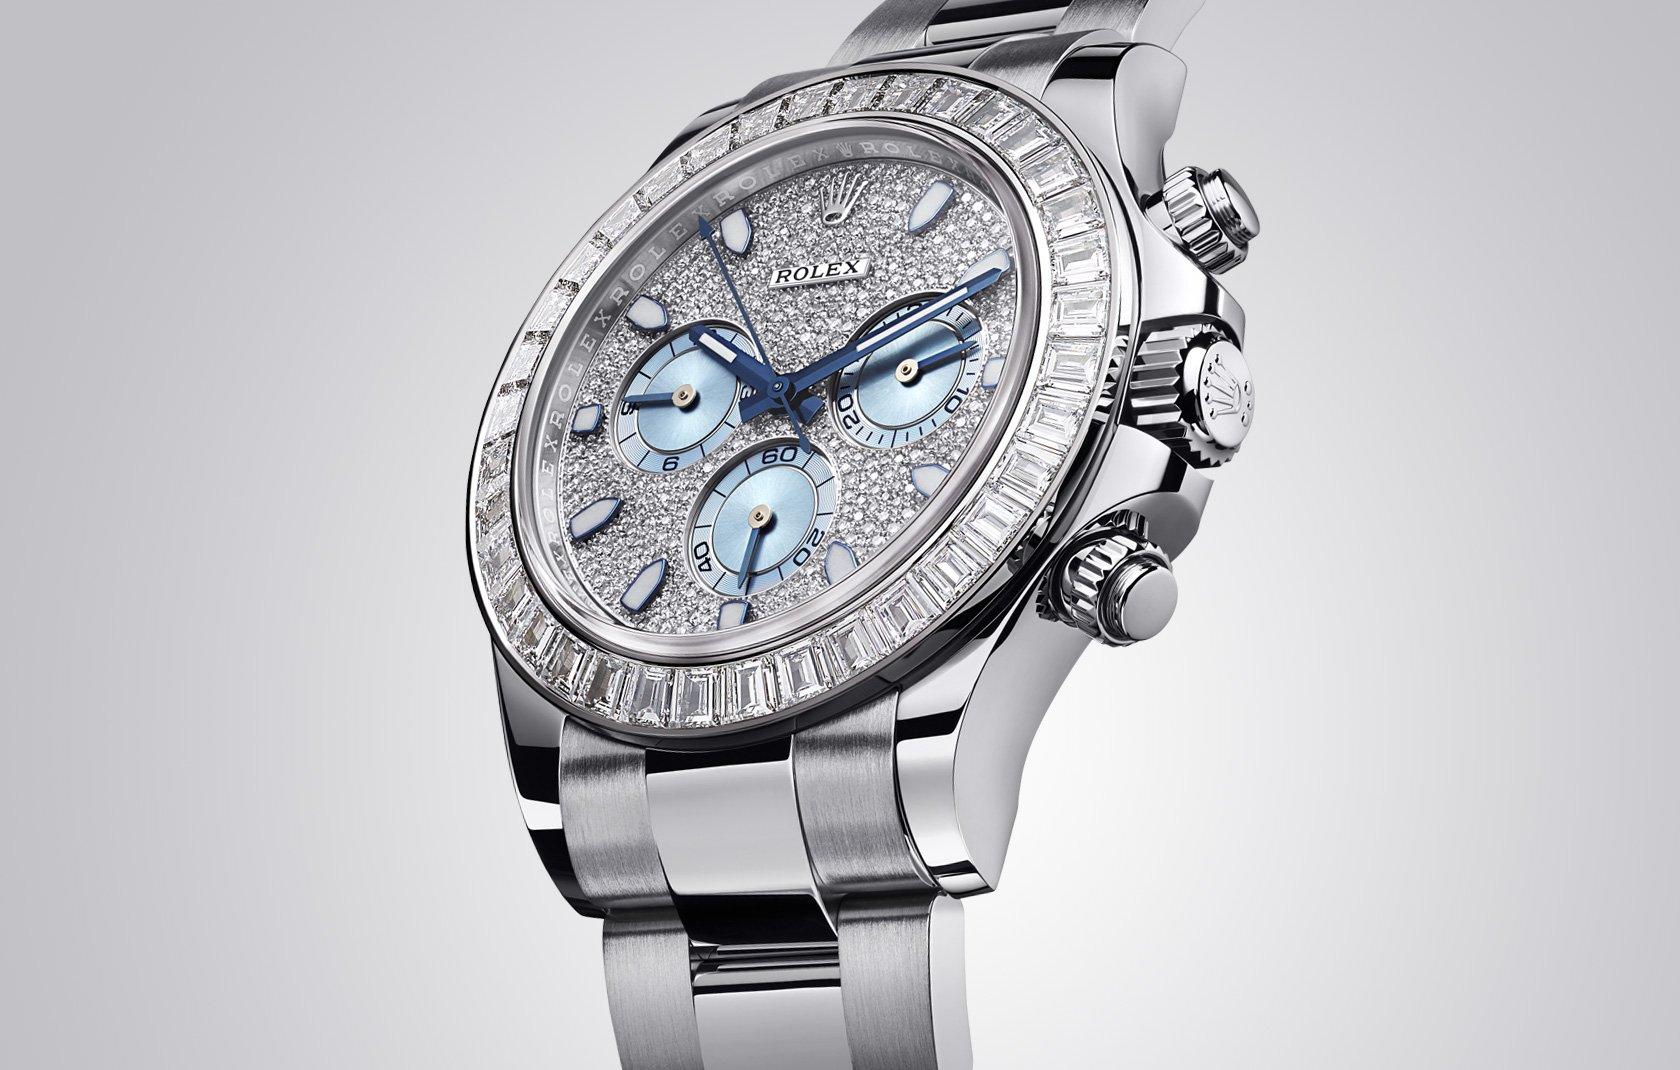 Novedades Rolex Baselworld 2014